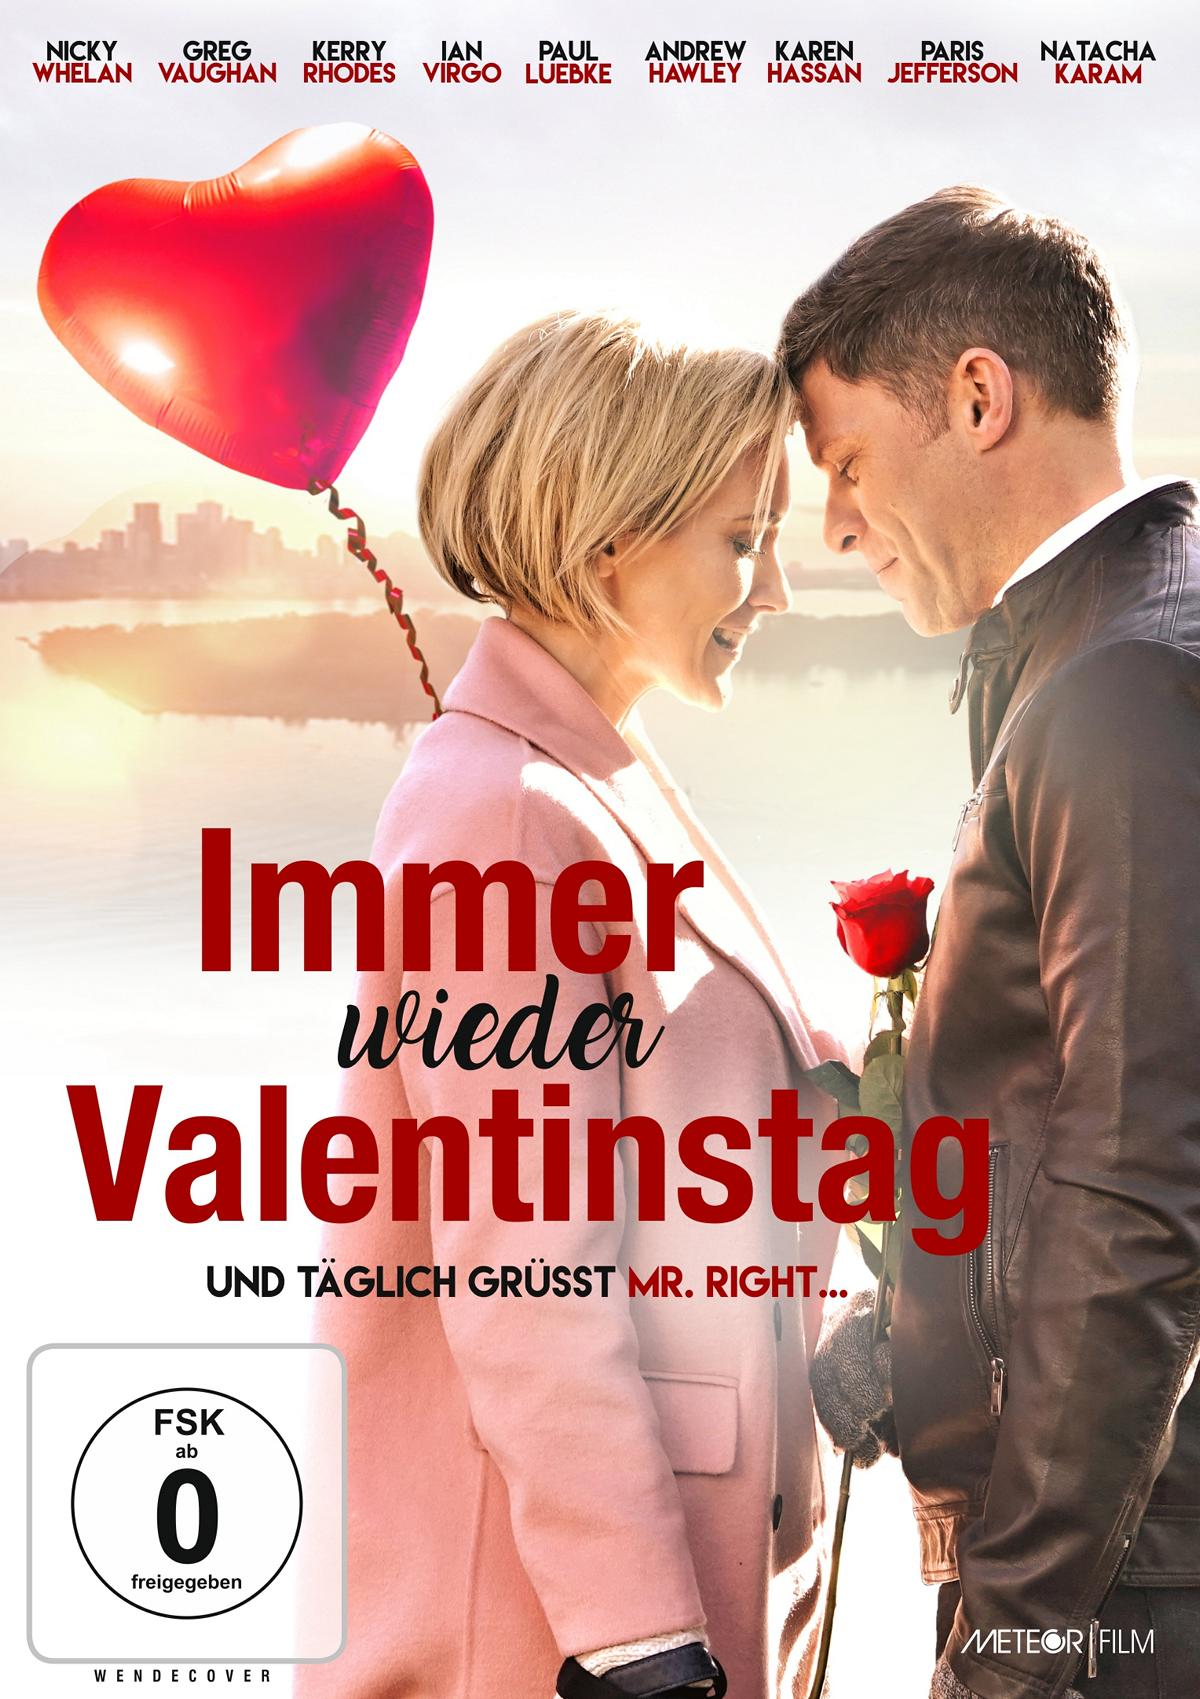 Valentinstag filme fur singles